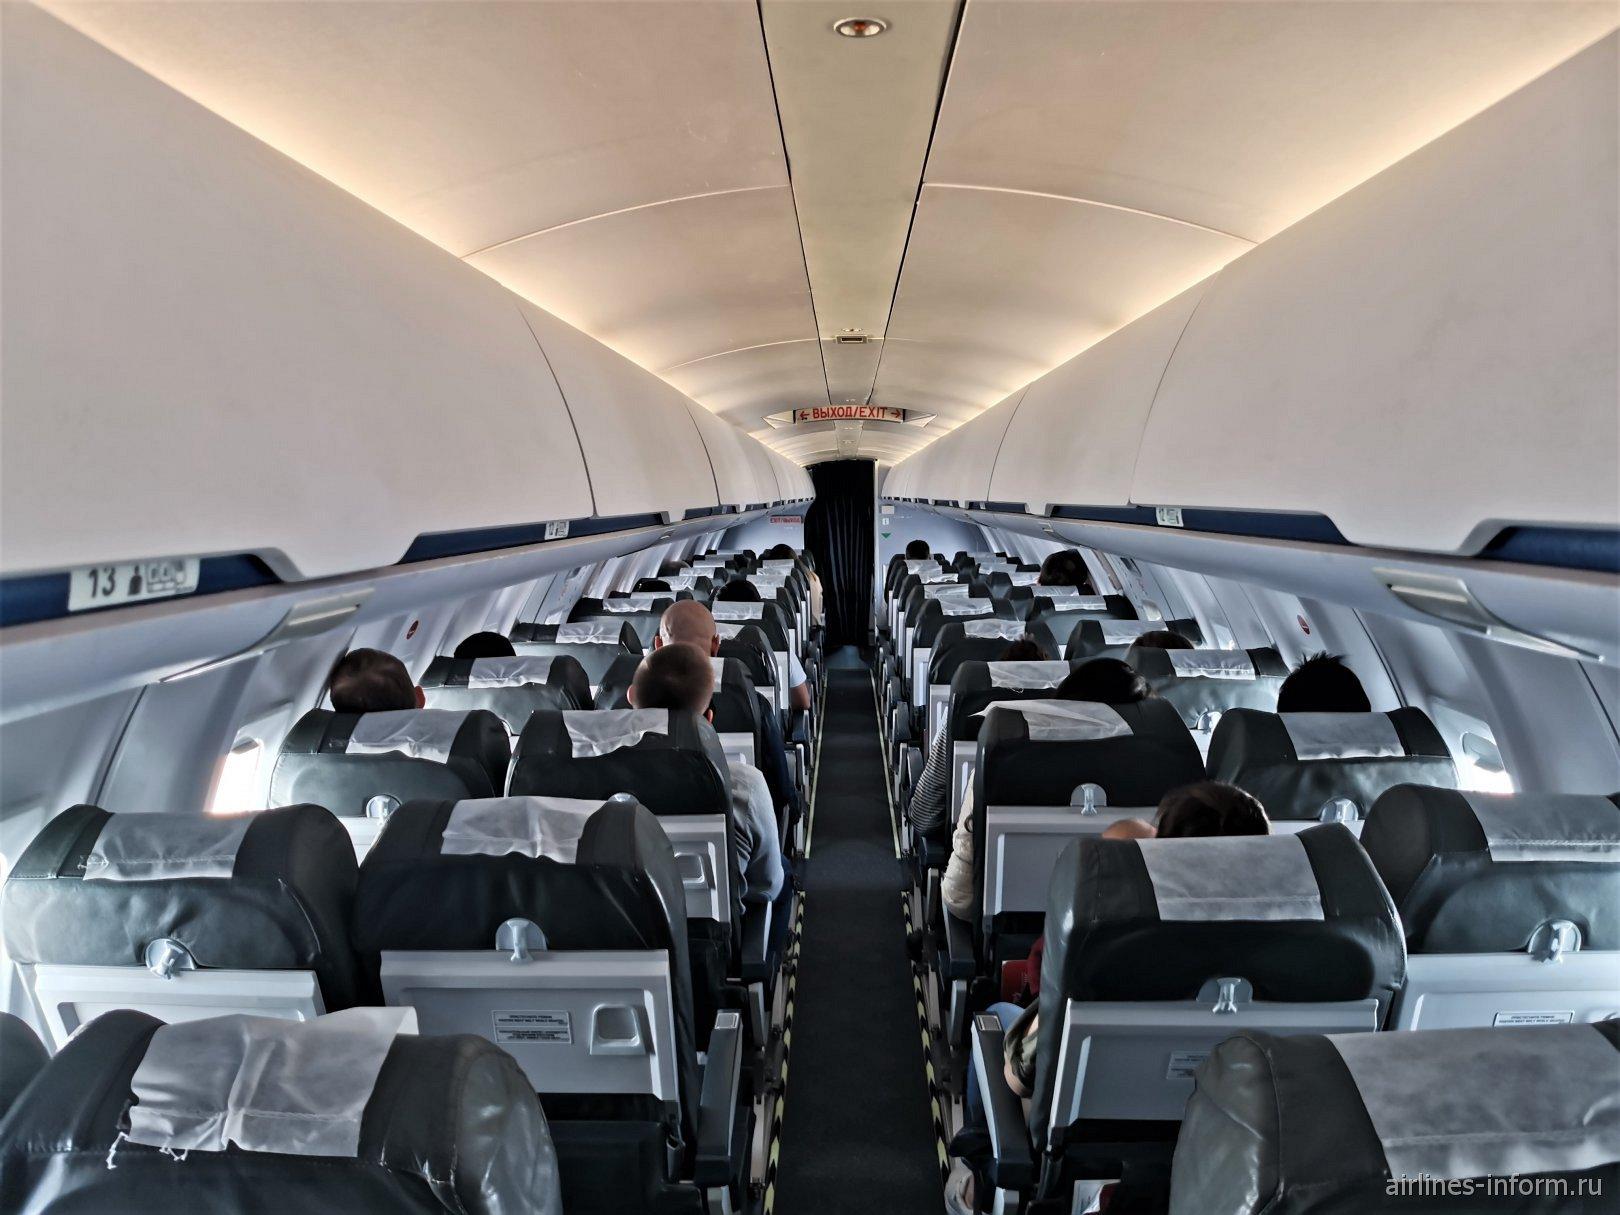 Пассажирский салон самолета Bombardier CRJ100 авиакомпании